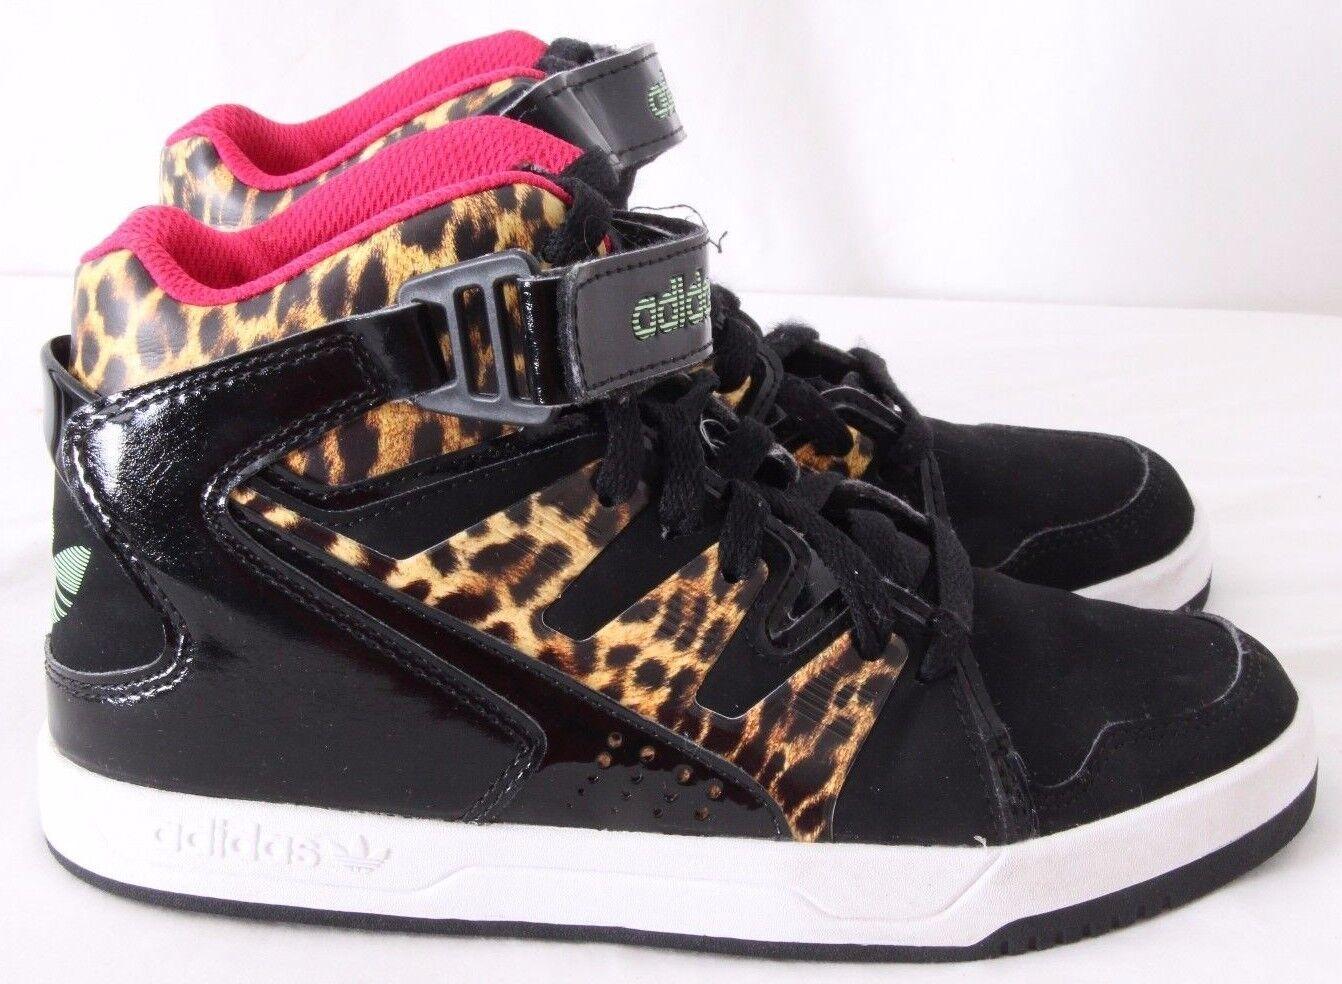 Adidas MC-X1 - Print Cheetah Hi Top - Sneakers à la mode mondialement célèbres - Femmes US 6